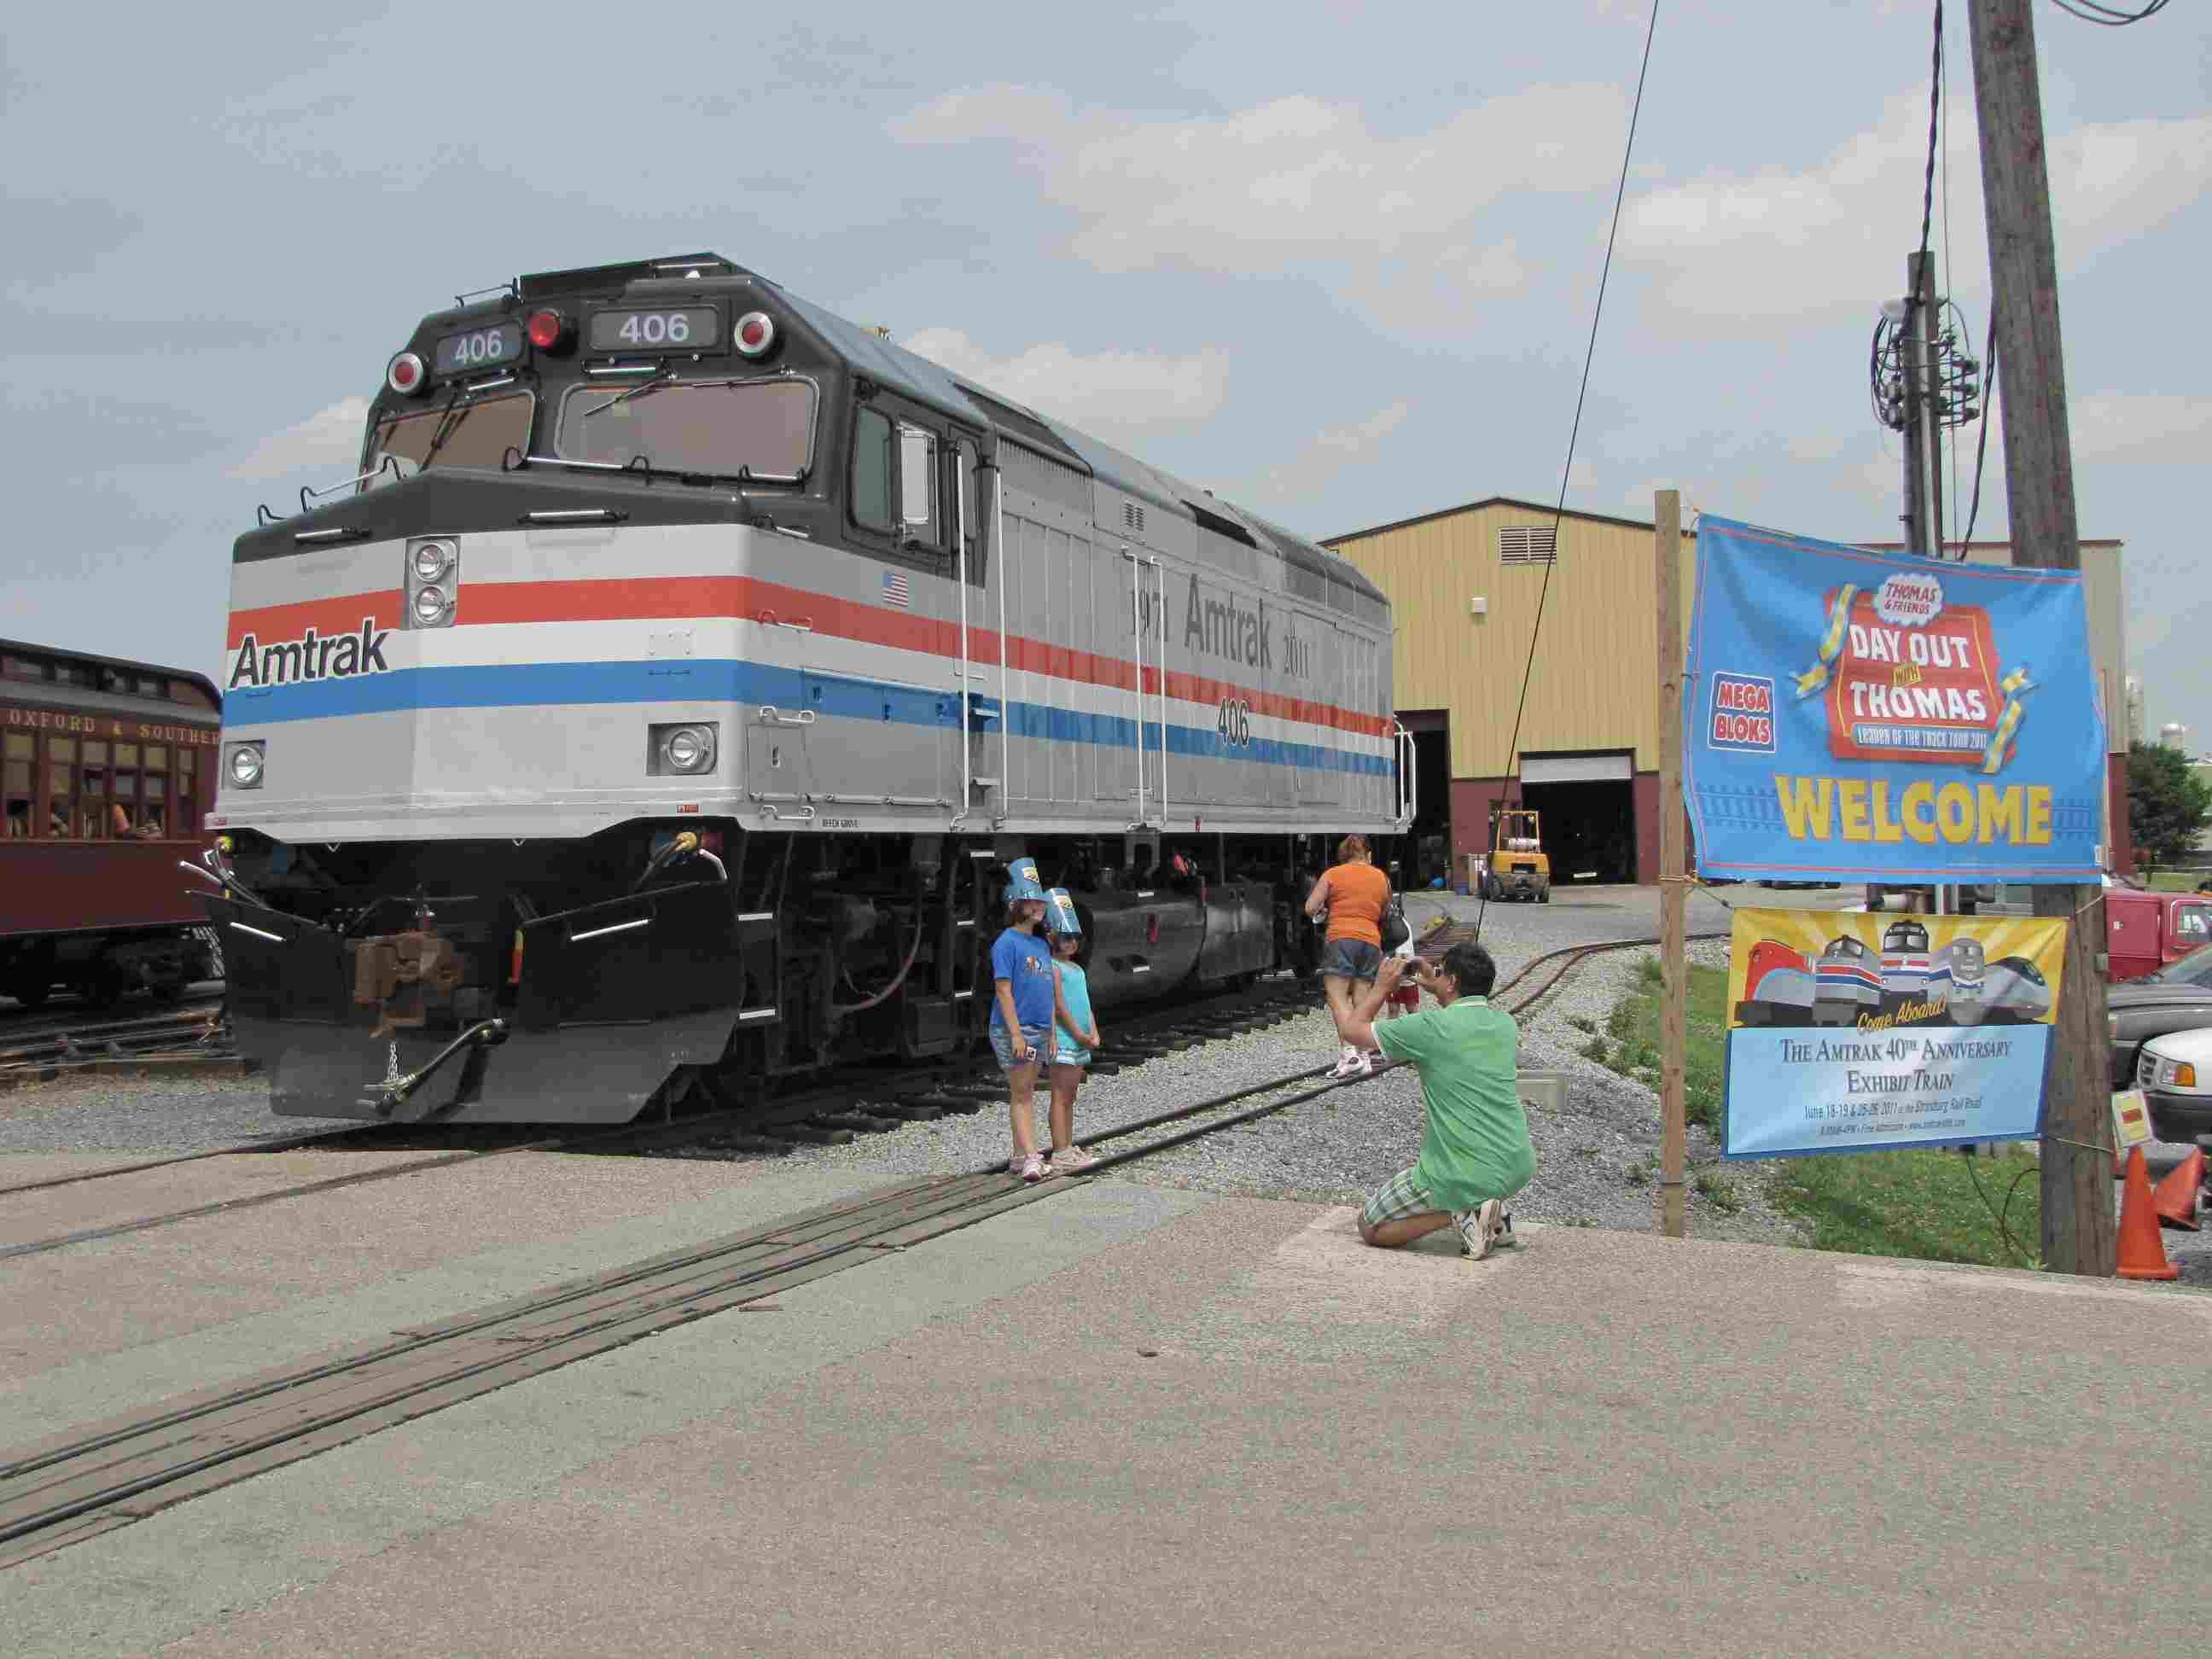 Amtrak S 40th Anniversary Train In Strasburg Pa